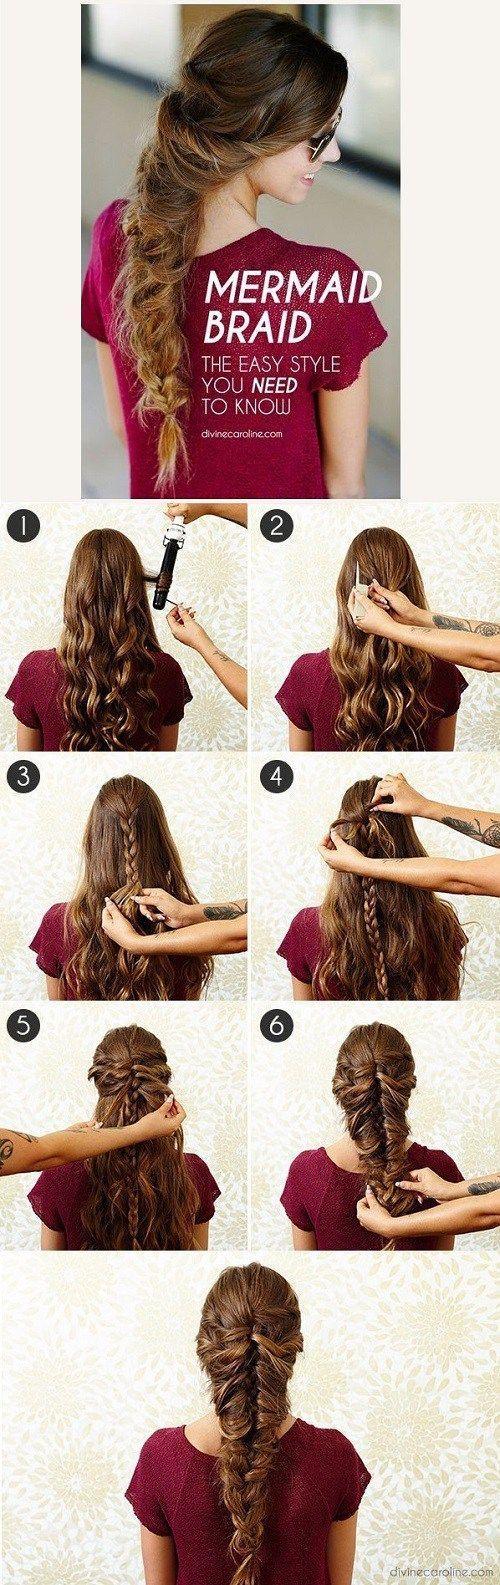 cabelos das sereias